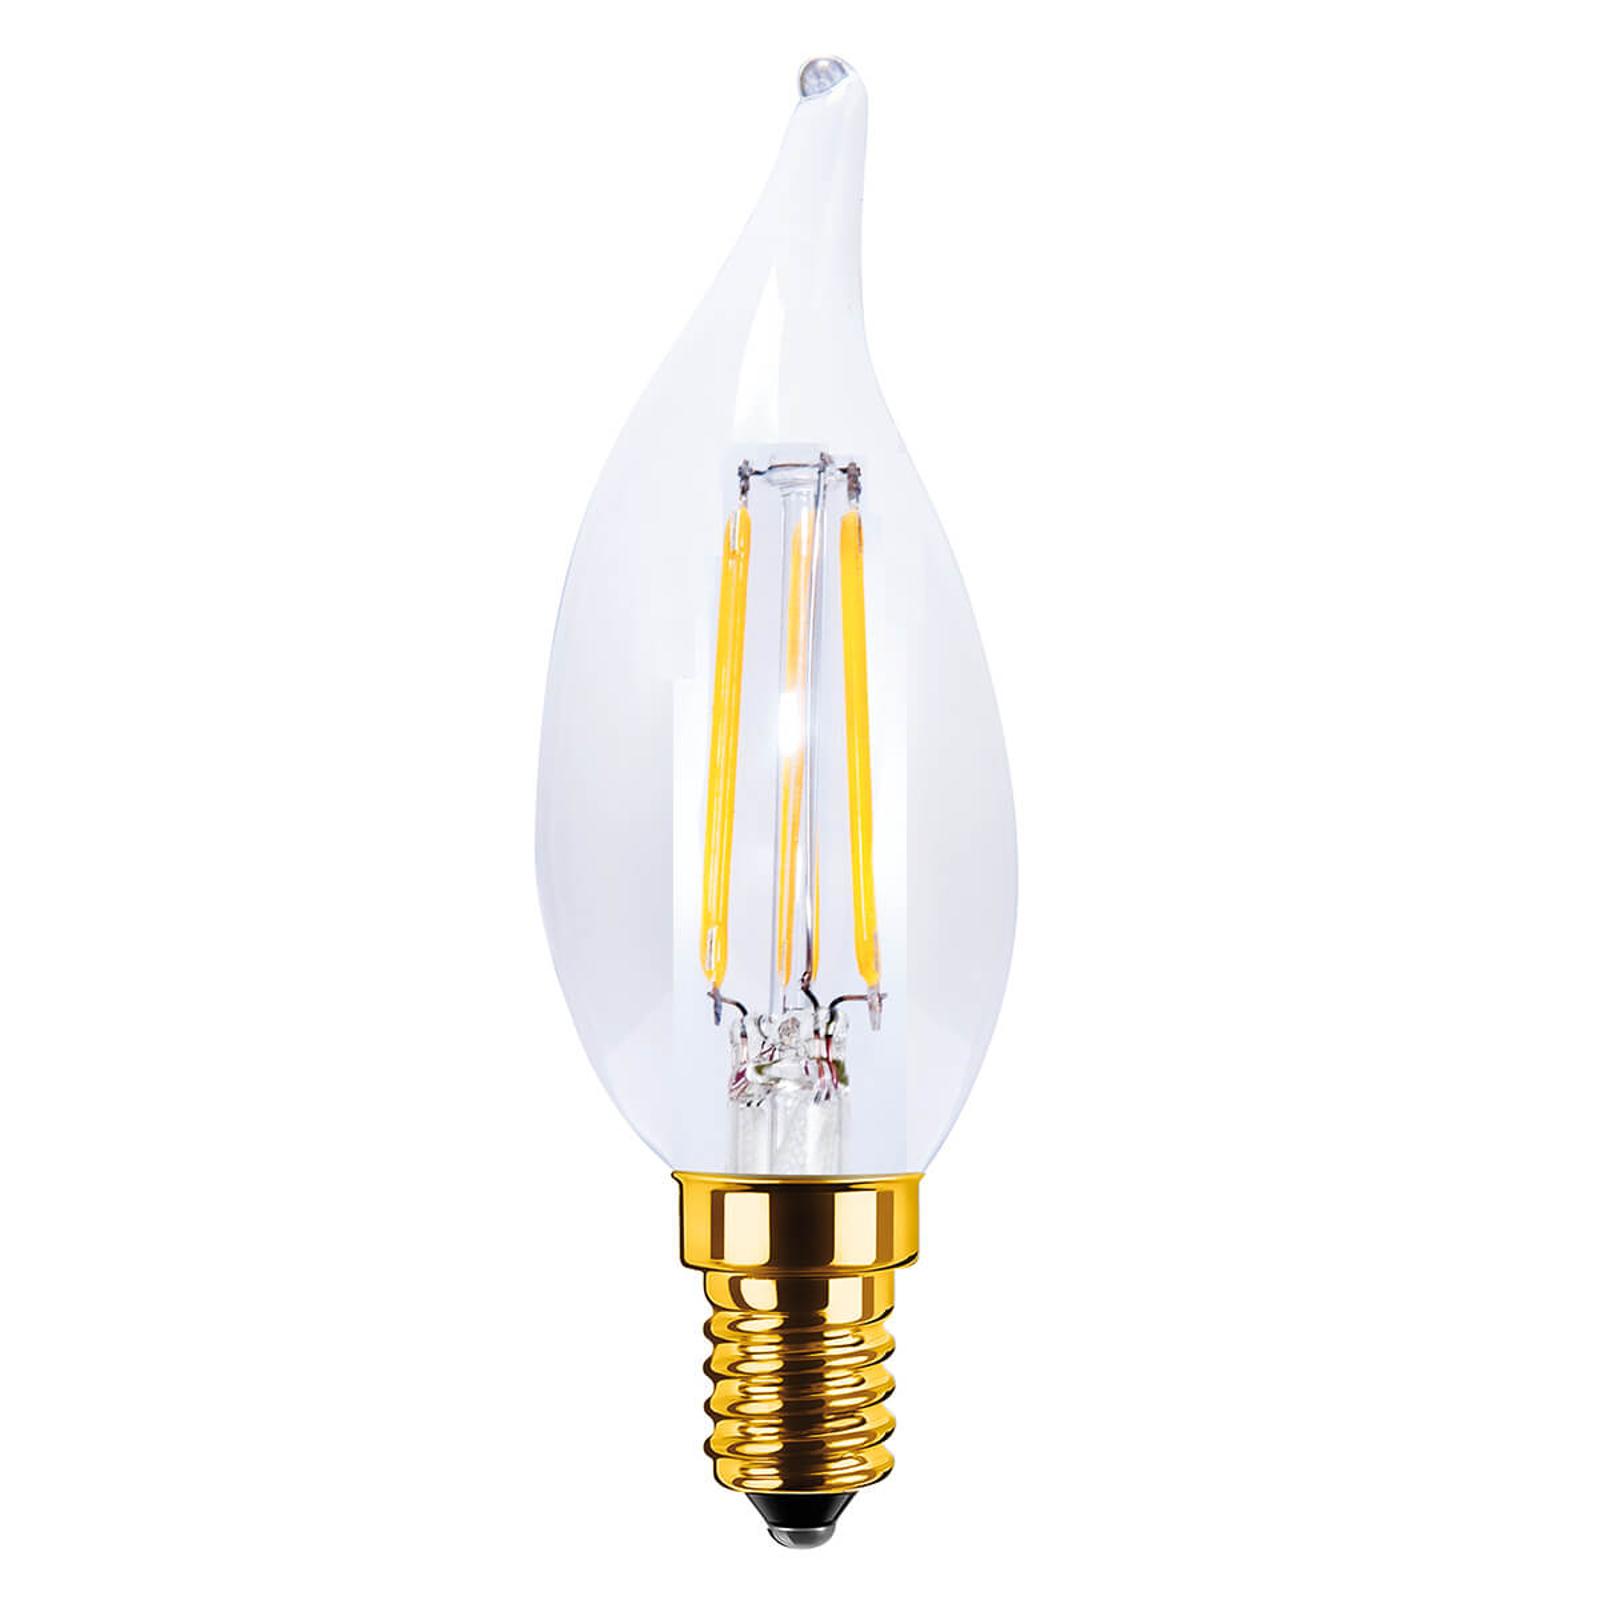 LED-kynttilälamppu E14 3,5 W 922, vintage, kirkas